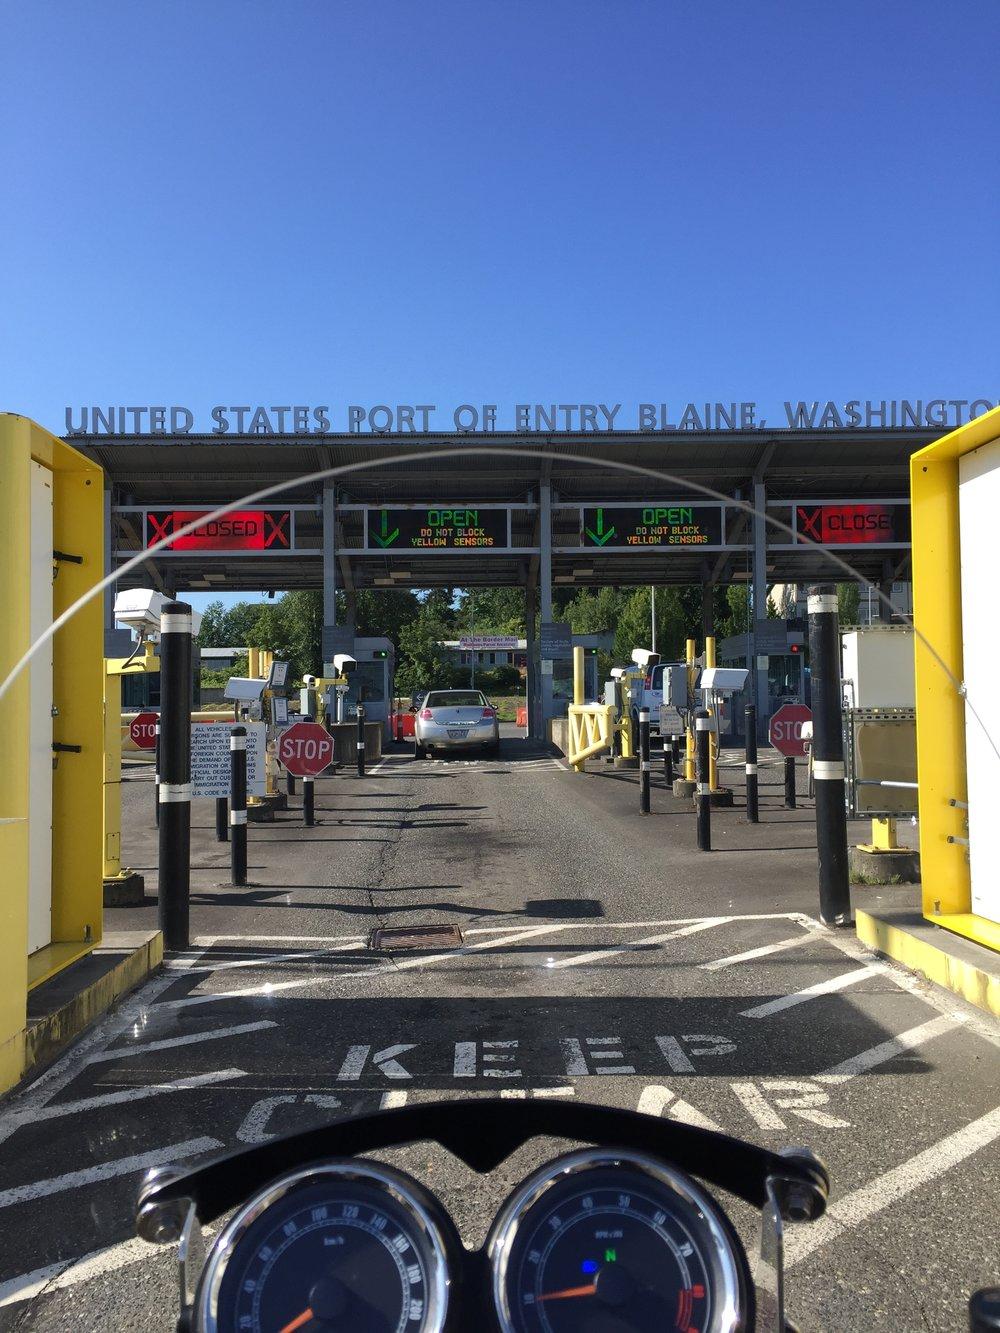 USA Border south of Vancouver BC